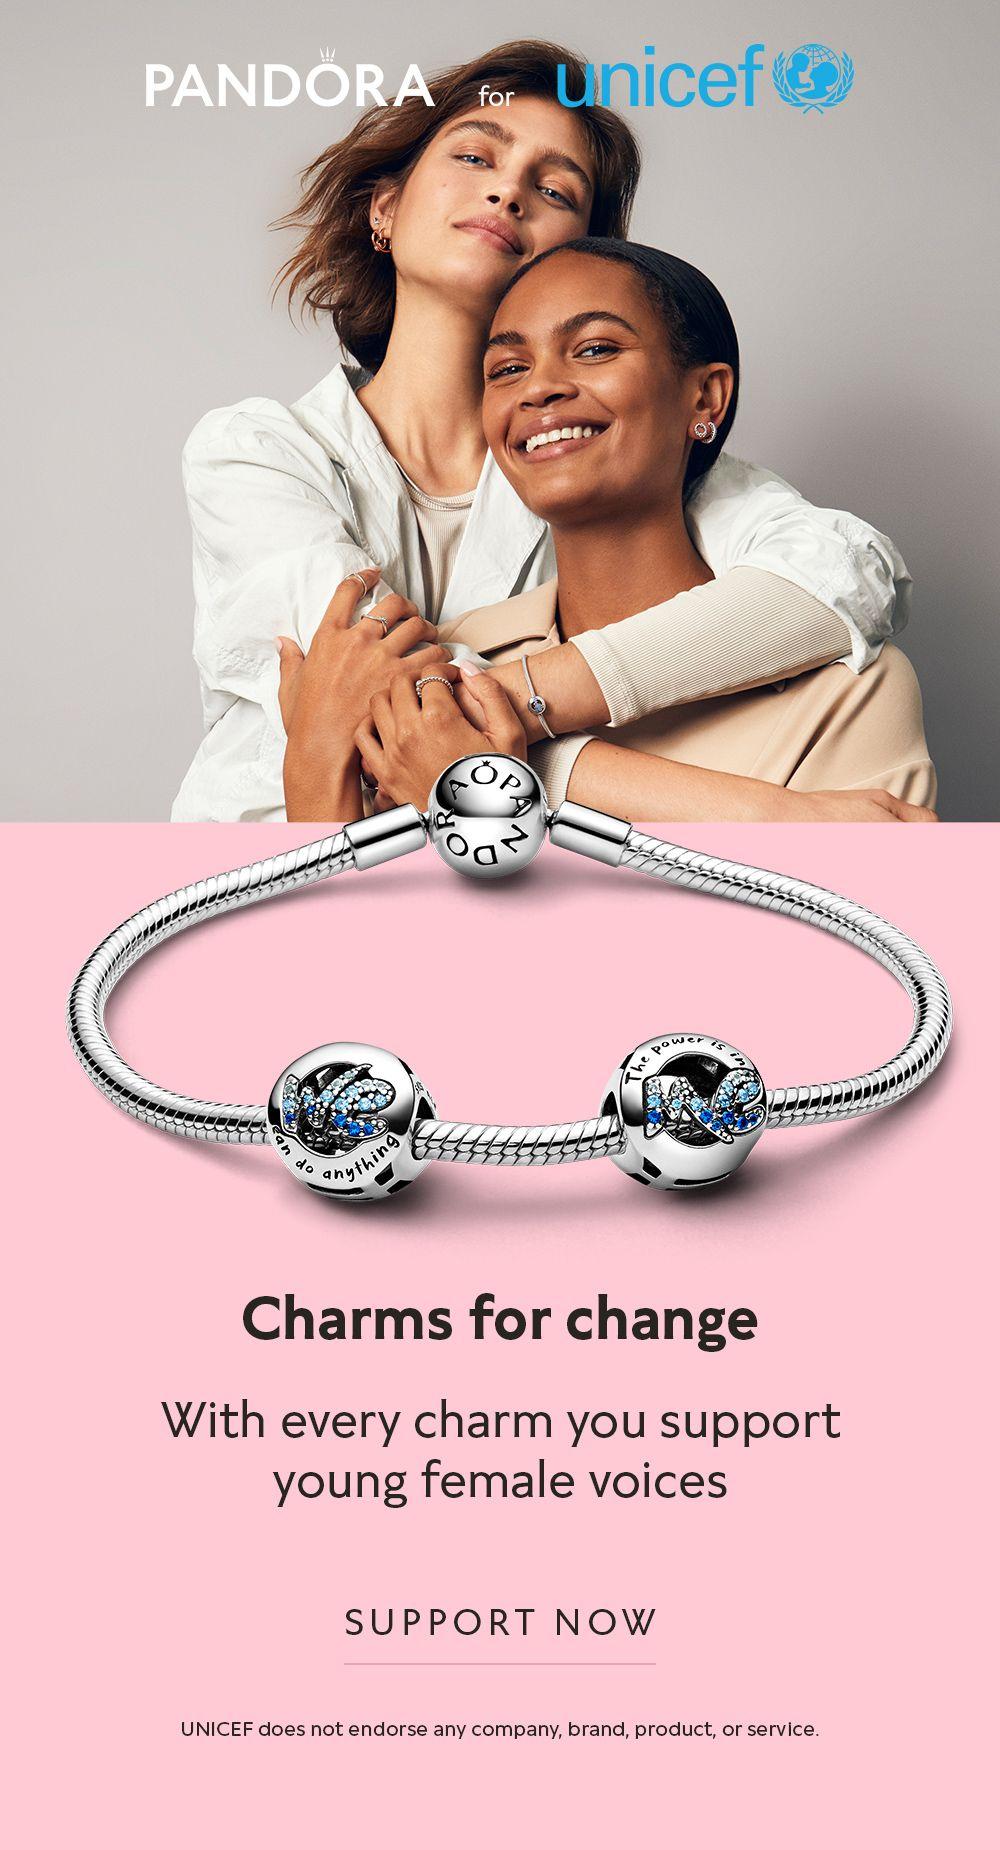 Charms for Change | Unicef, Pandora, Pandora bracelet charms